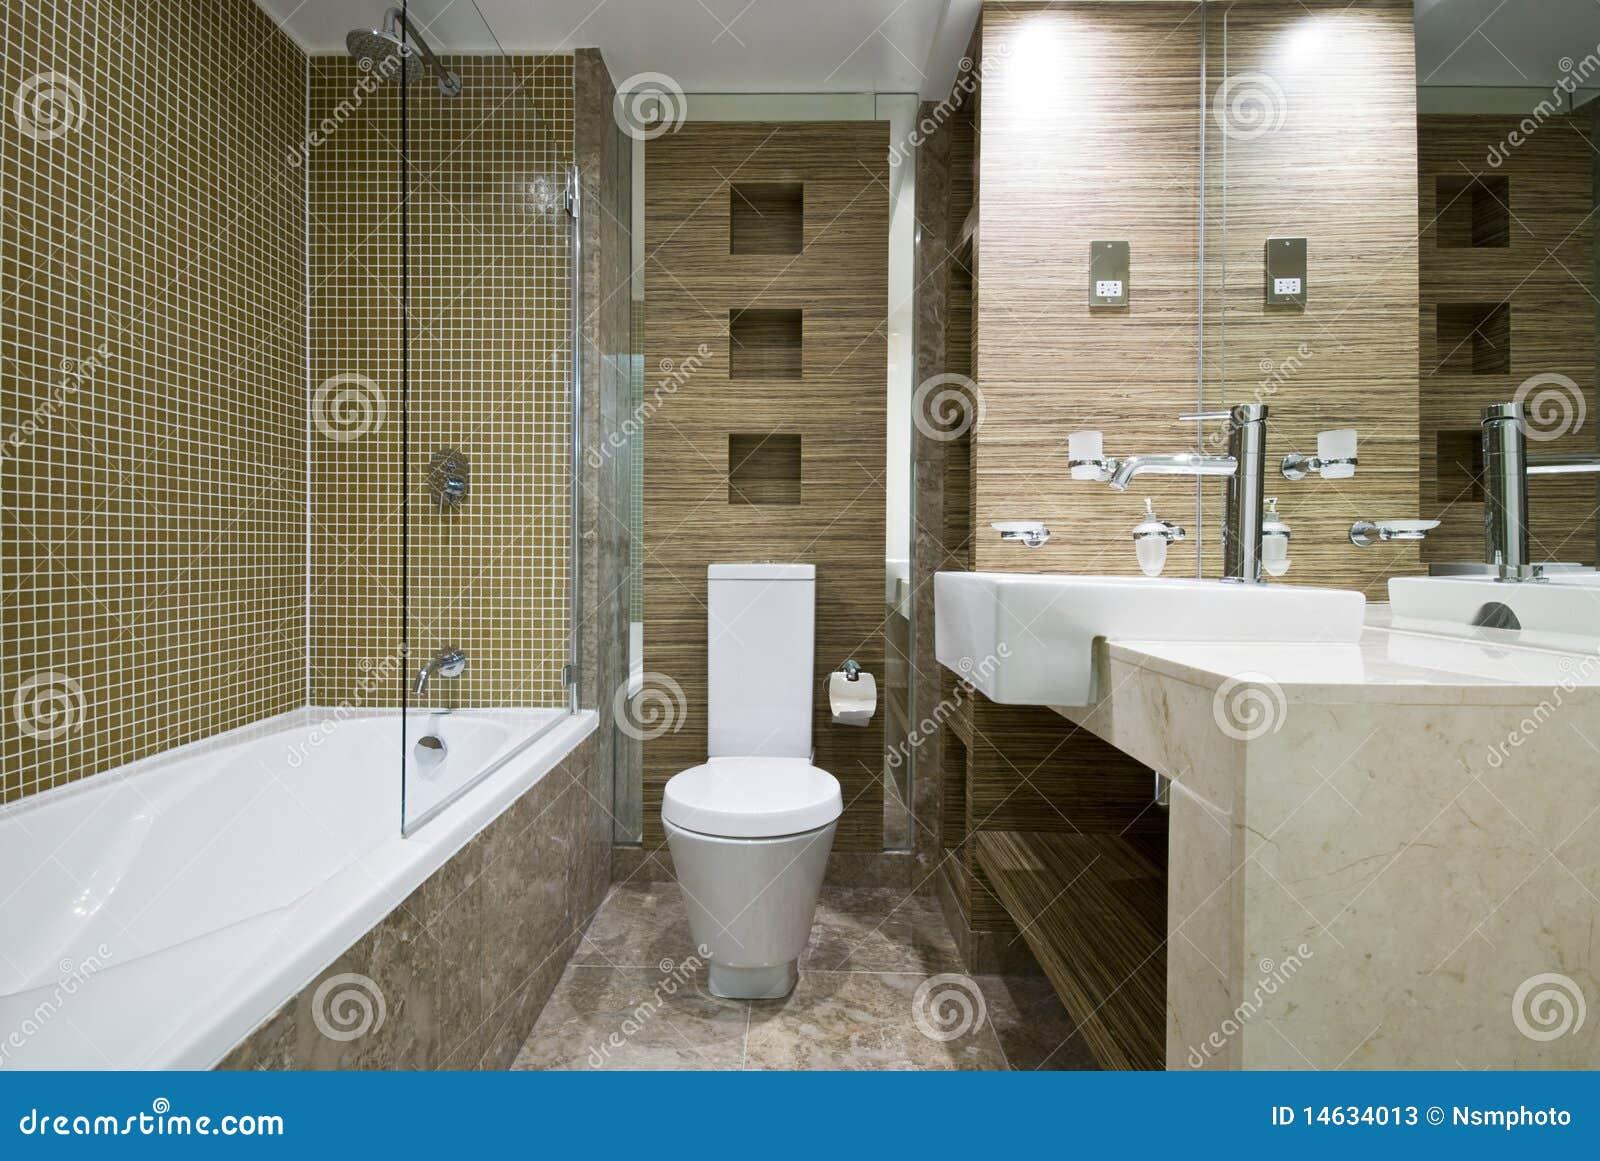 Marmeren Badkamer Vloer ~ Stock Foto's Moderne badkamers met marmeren vloer en moza?ektegels